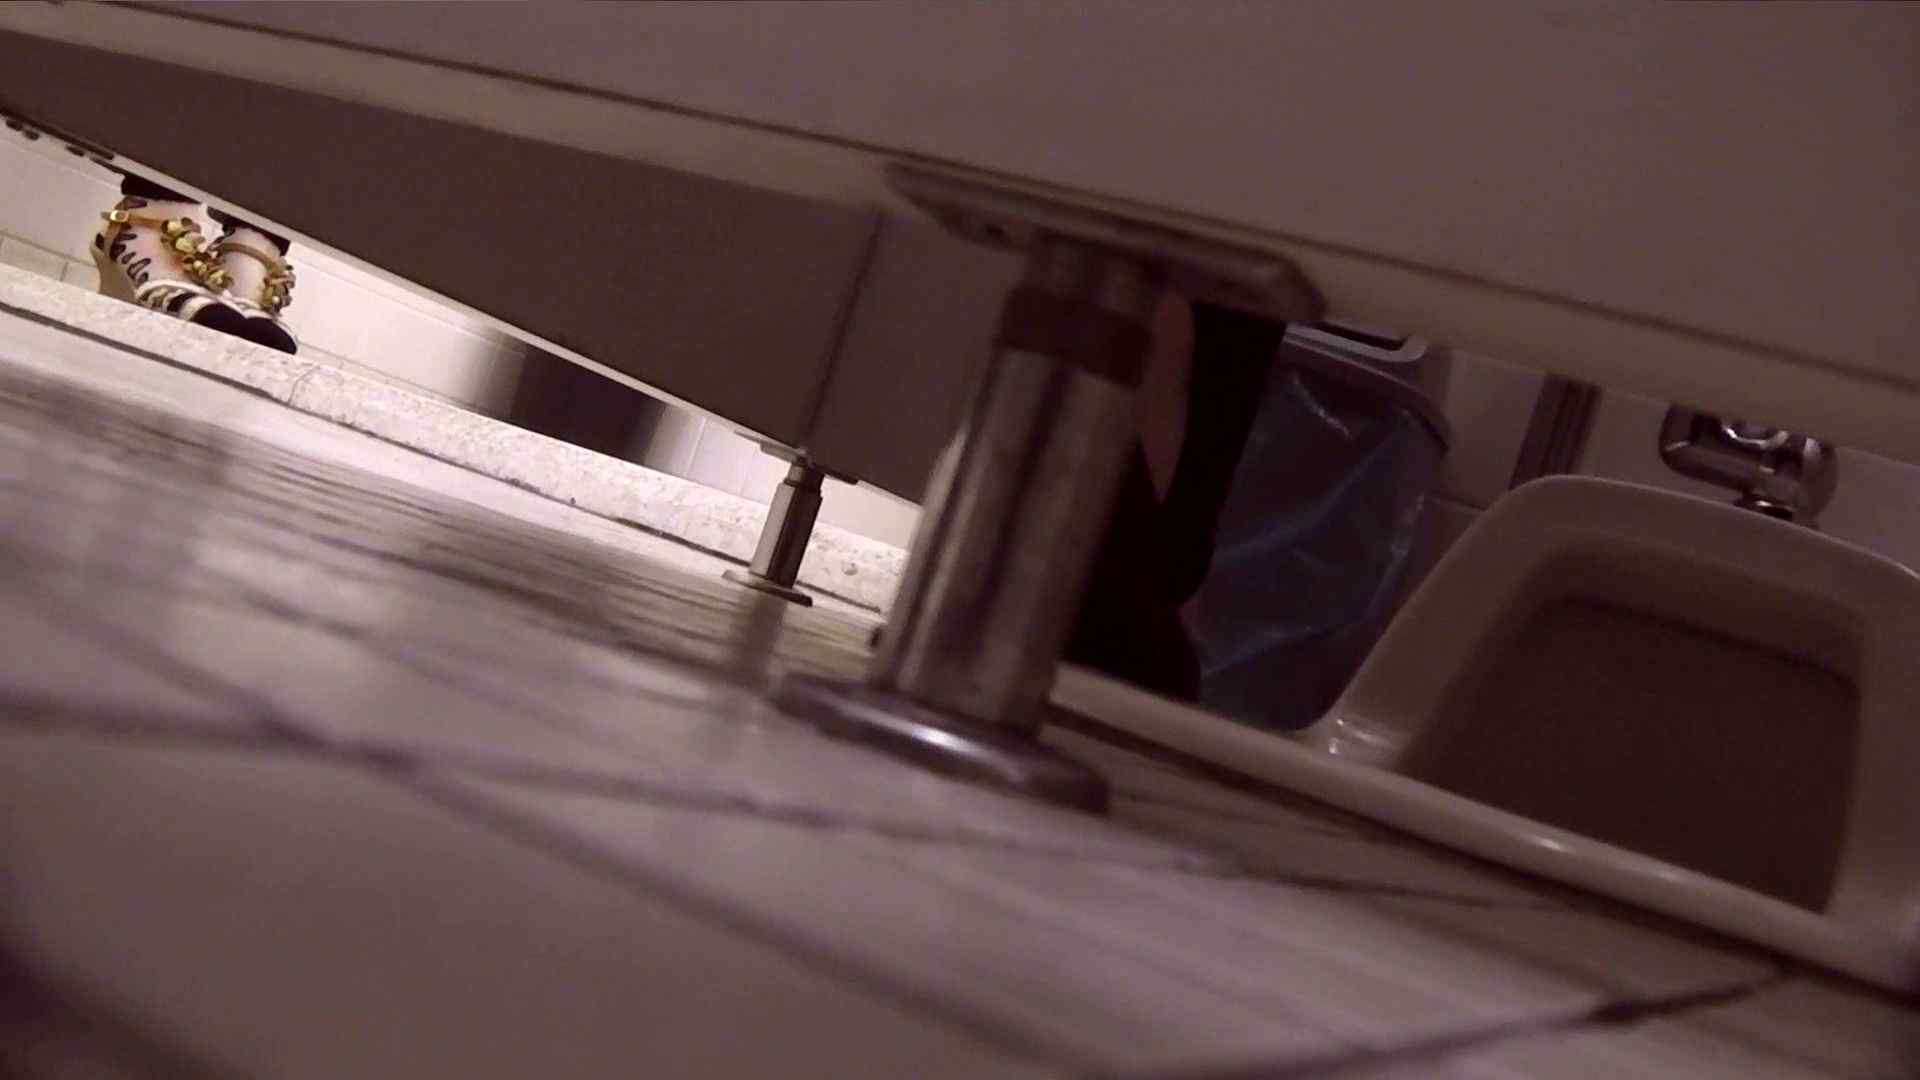 vol.15 命がけ潜伏洗面所! 肌荒れ注意報!! プライベート 隠し撮りすけべAV動画紹介 102画像 35